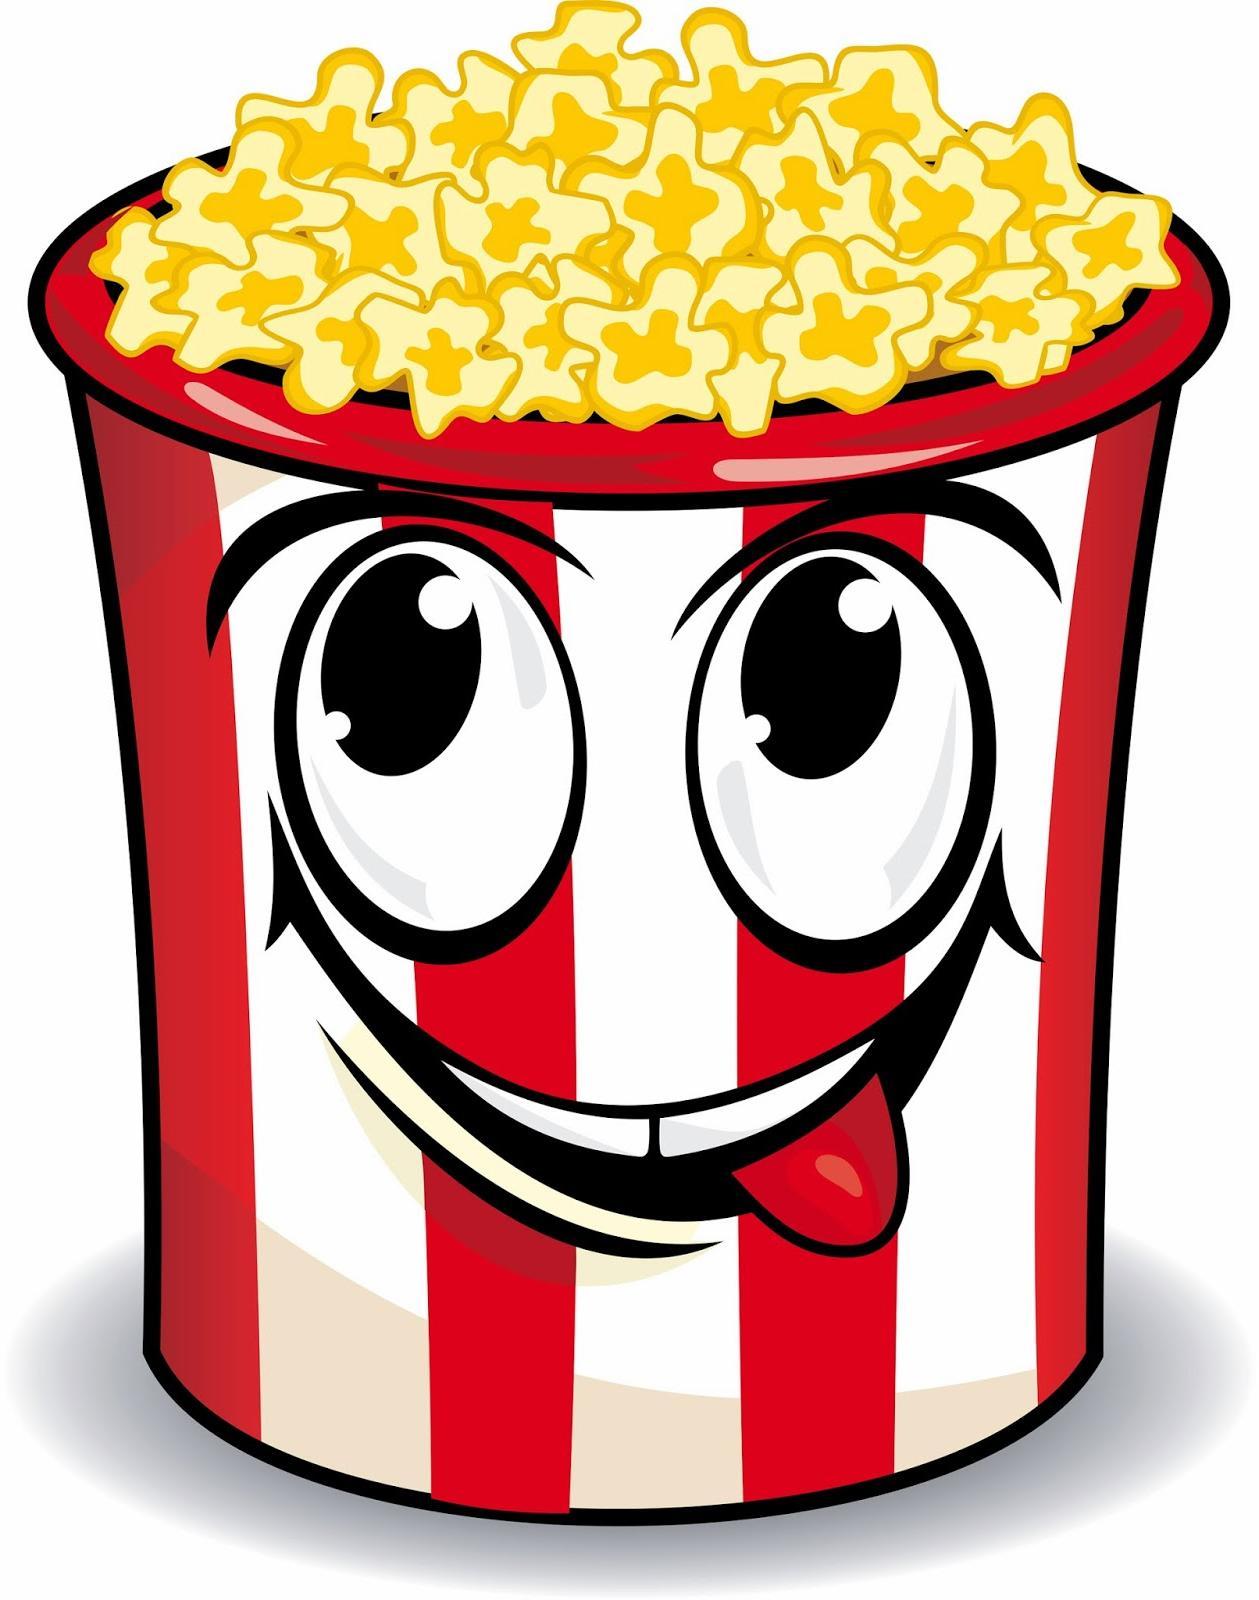 1259x1600 Best Hd Popcorn Clipart Free Clip Art Images Image